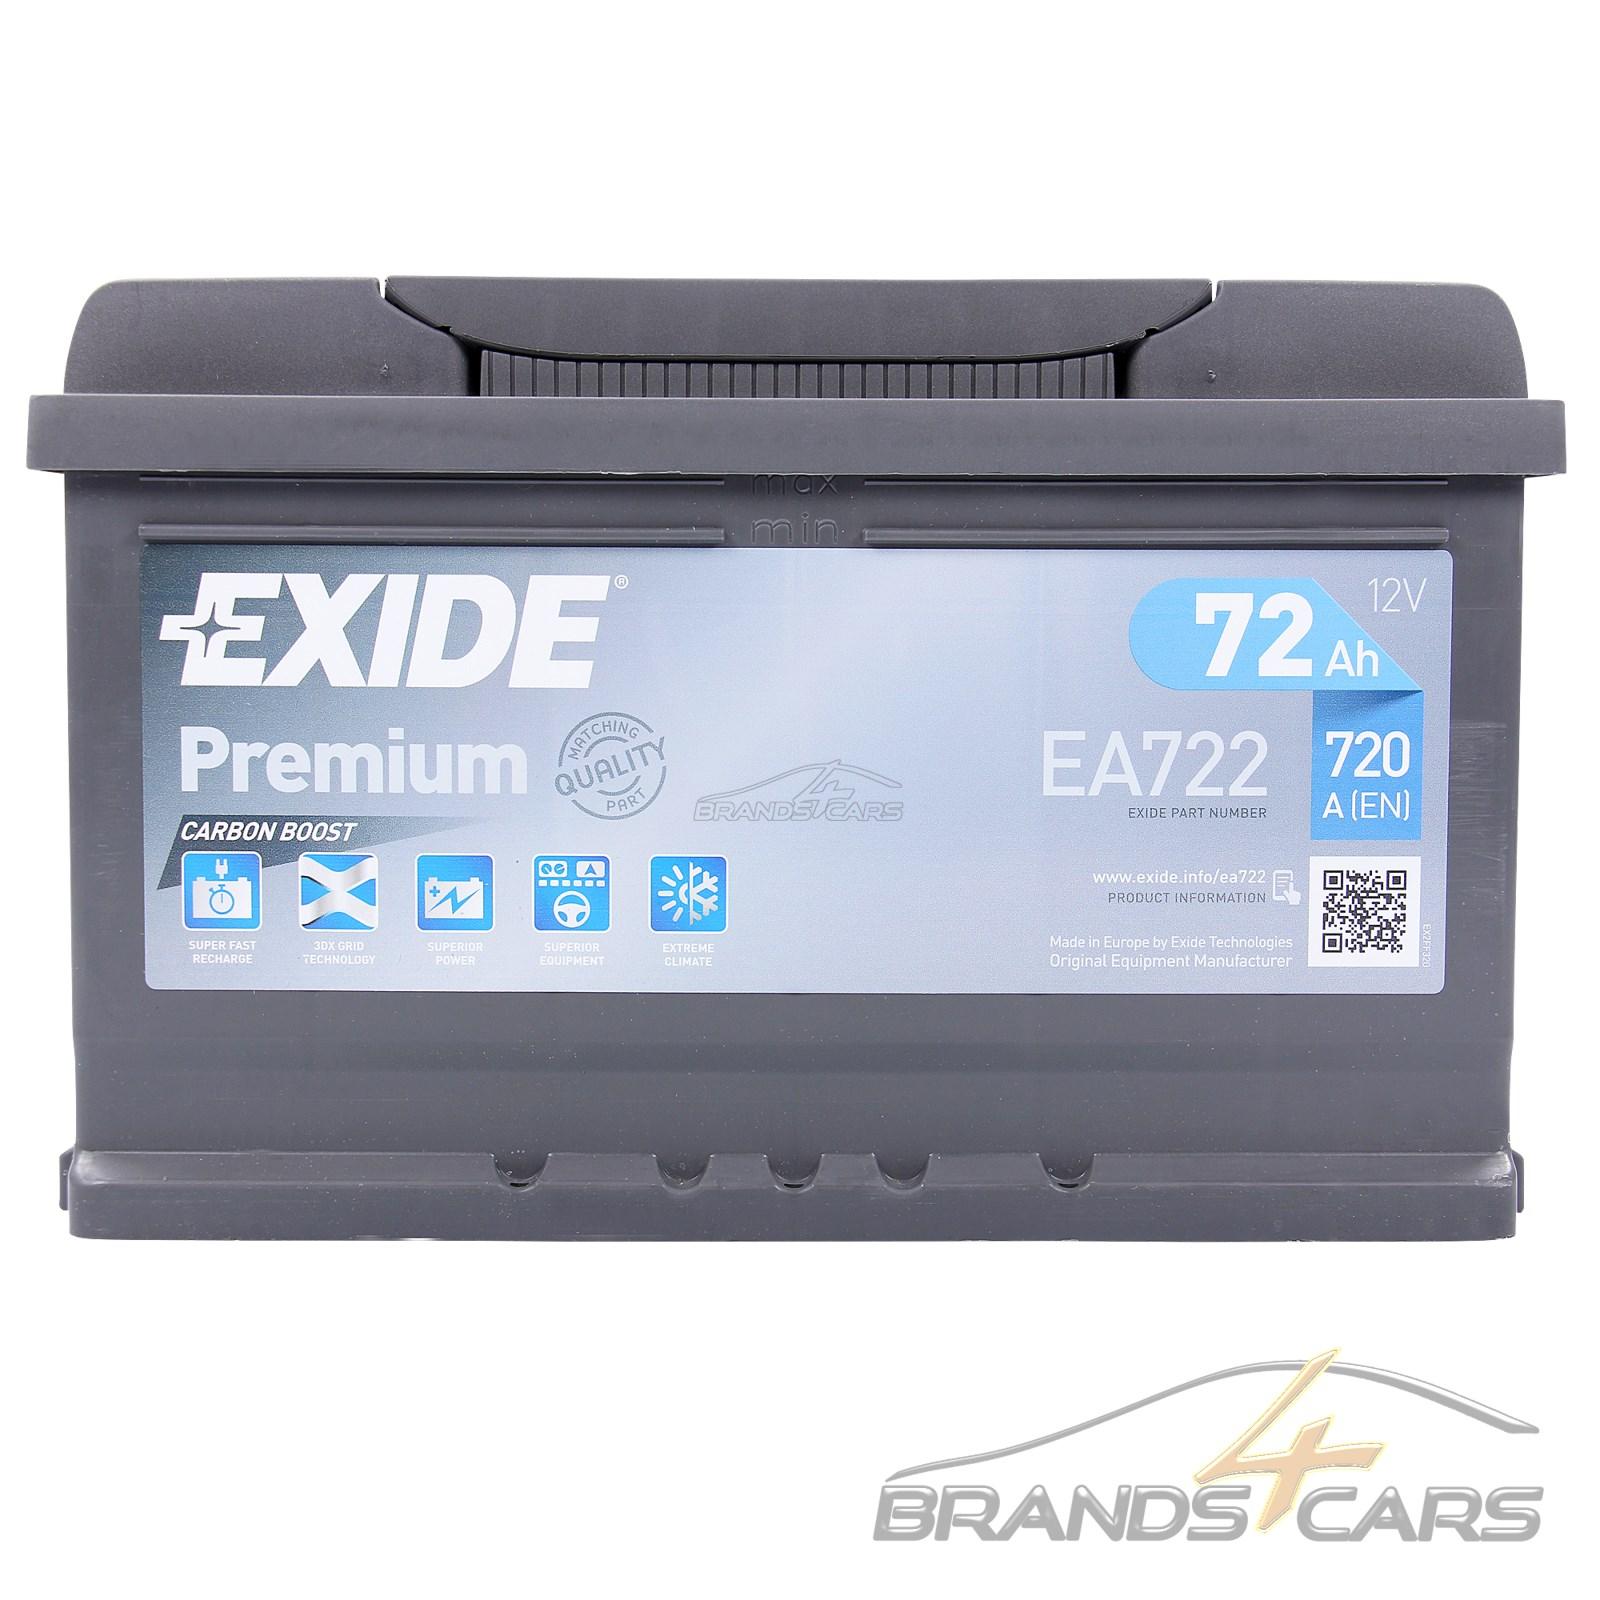 autobatterie exide ea722 premium carbon boost 72 ah 720 a 31962301 ebay. Black Bedroom Furniture Sets. Home Design Ideas